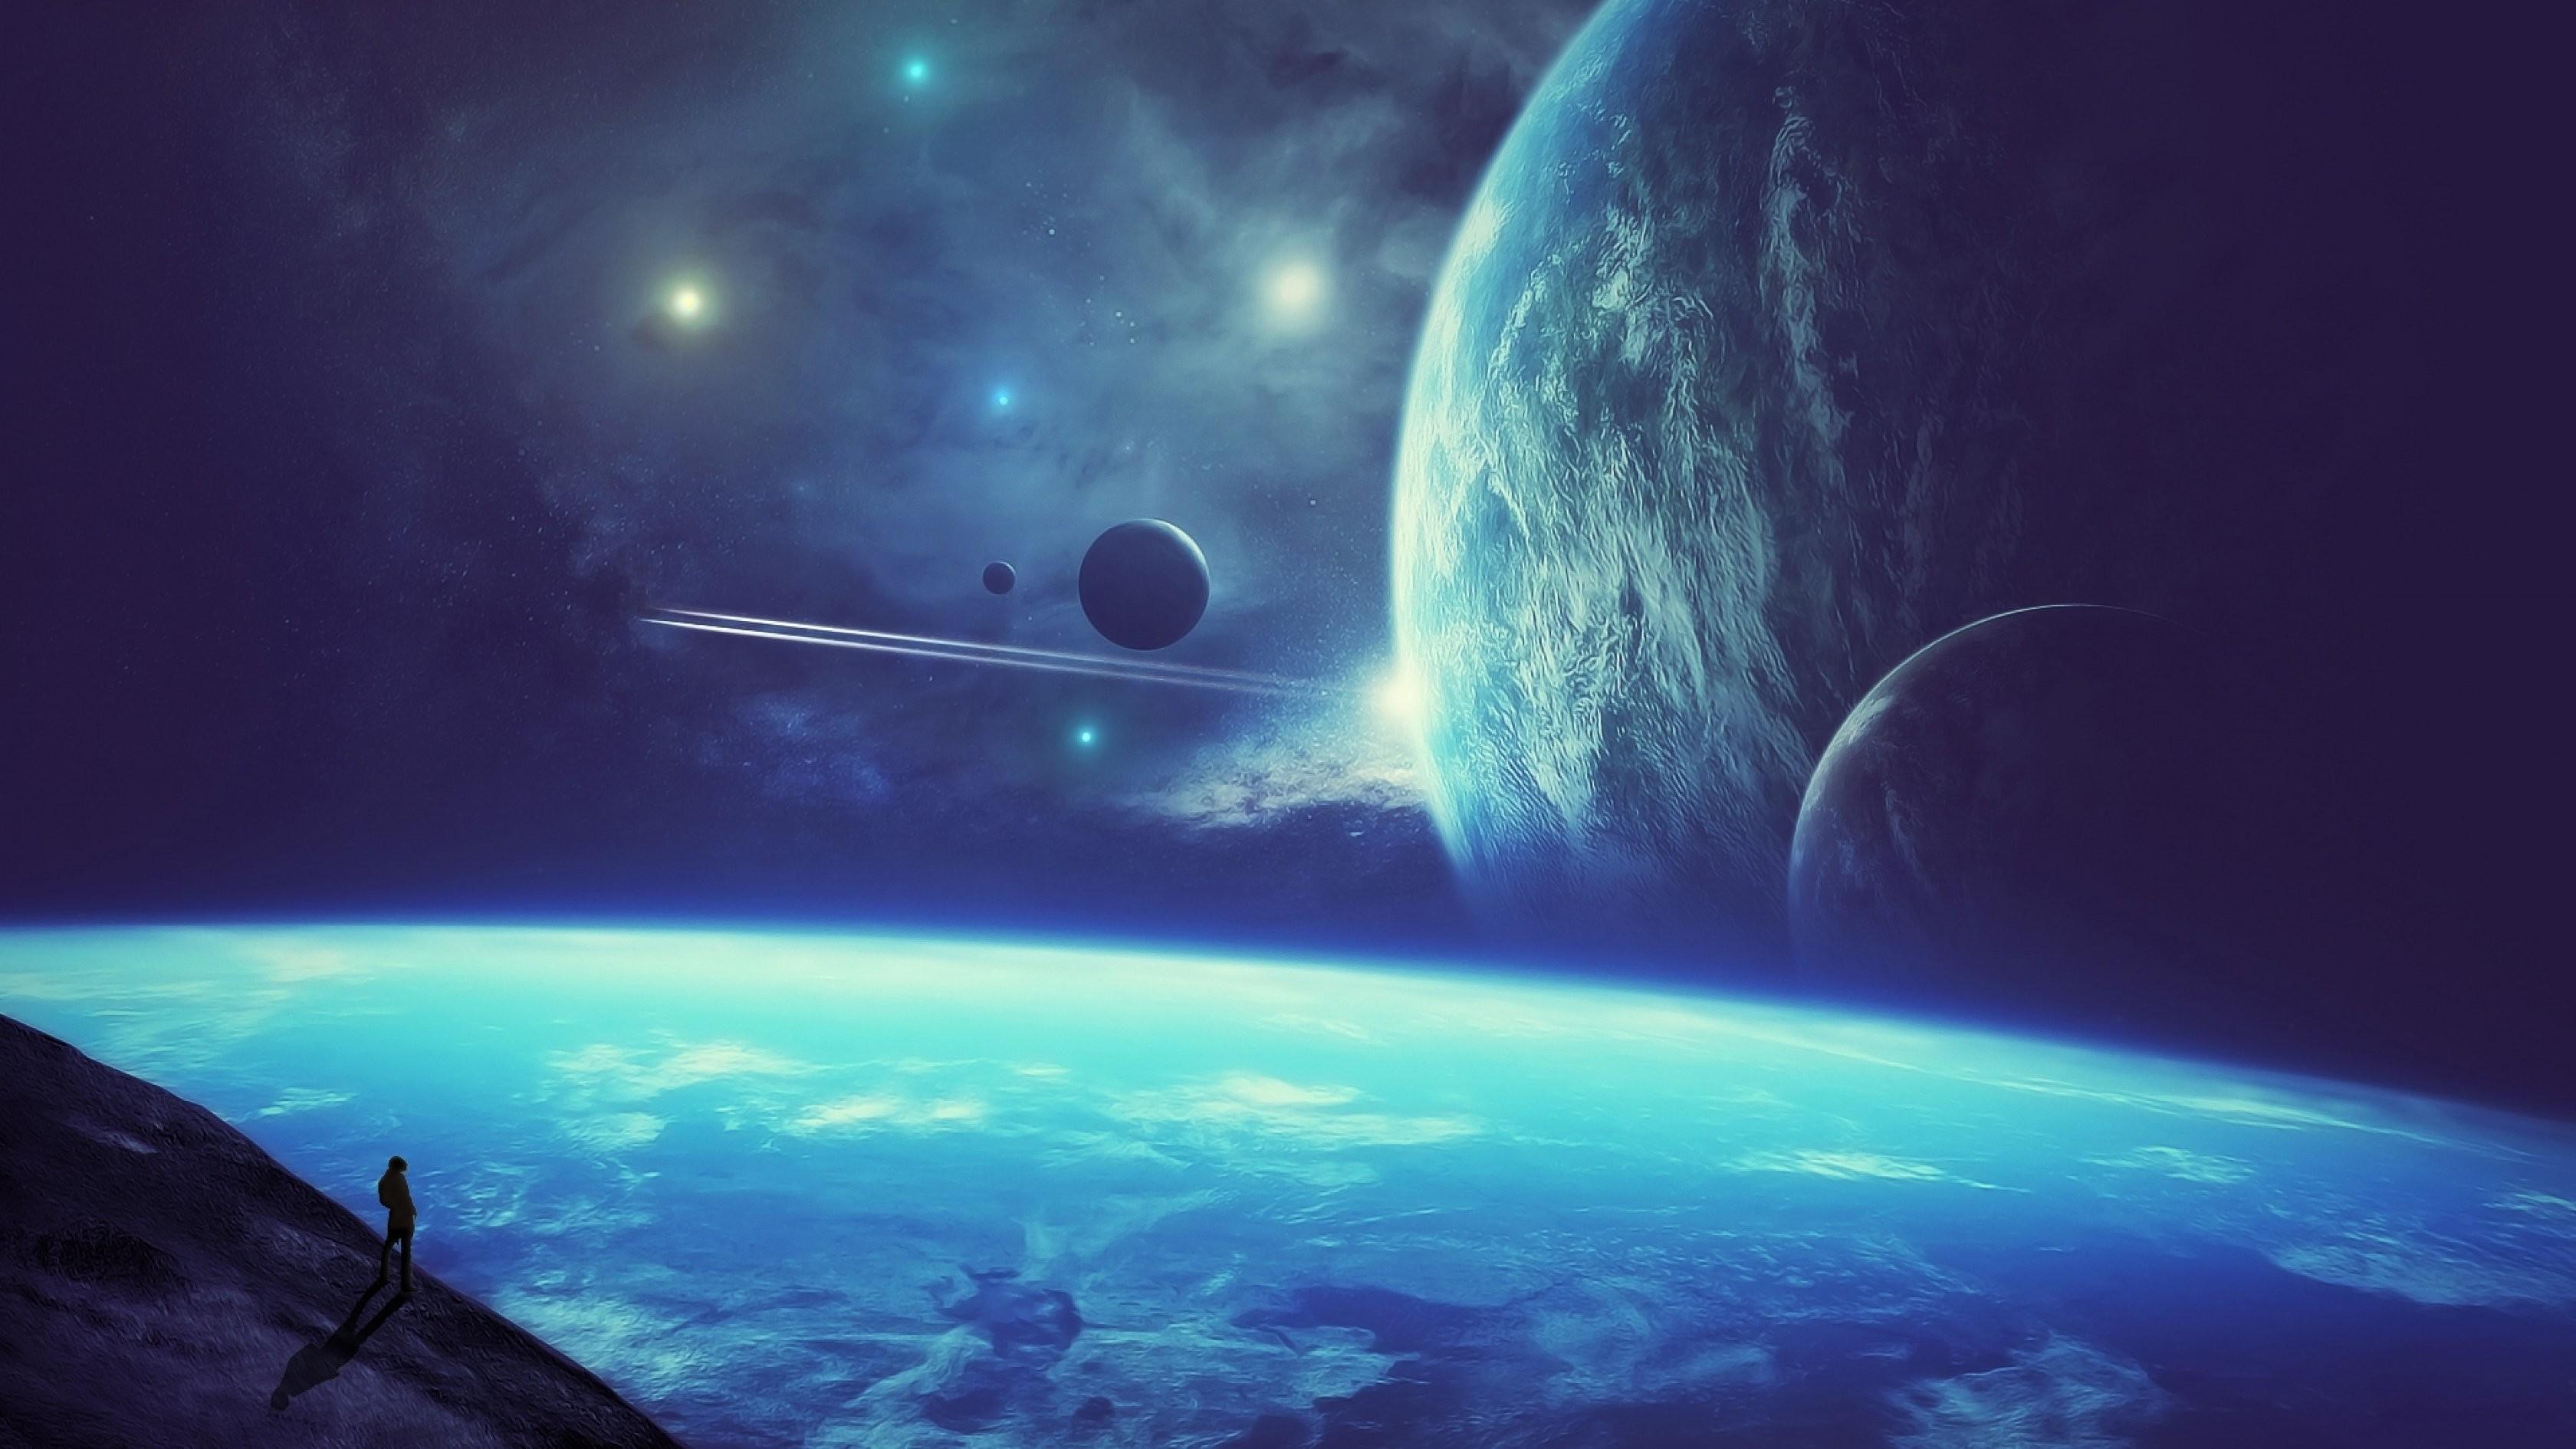 Planetscape sci-fi planet landscape space art artwork wallpaper |  | 660348 | WallpaperUP